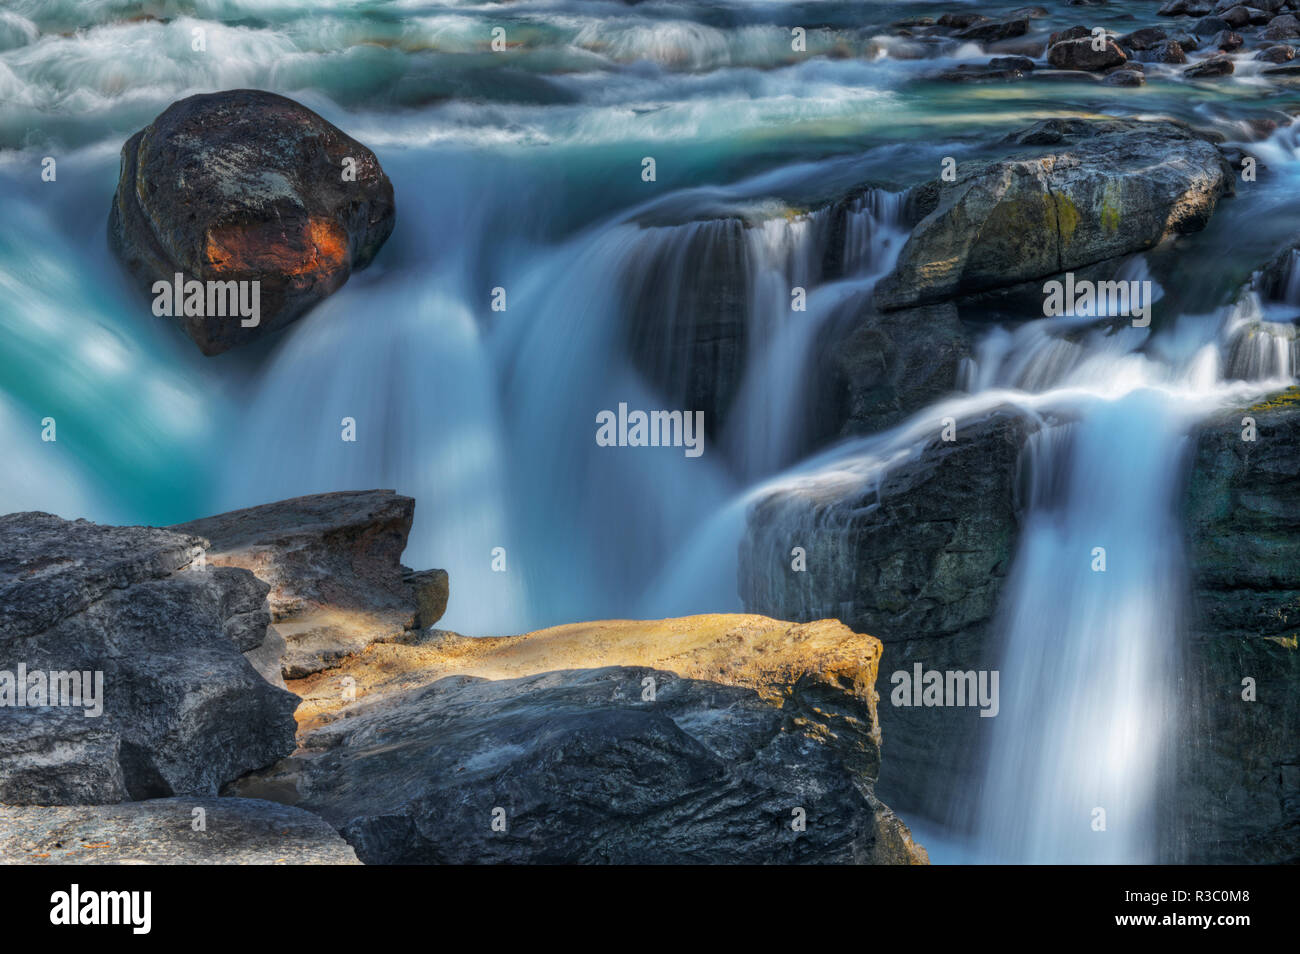 Kanada, Alberta, Jasper National Park. Close-up Sunwapta Falls. Stockbild